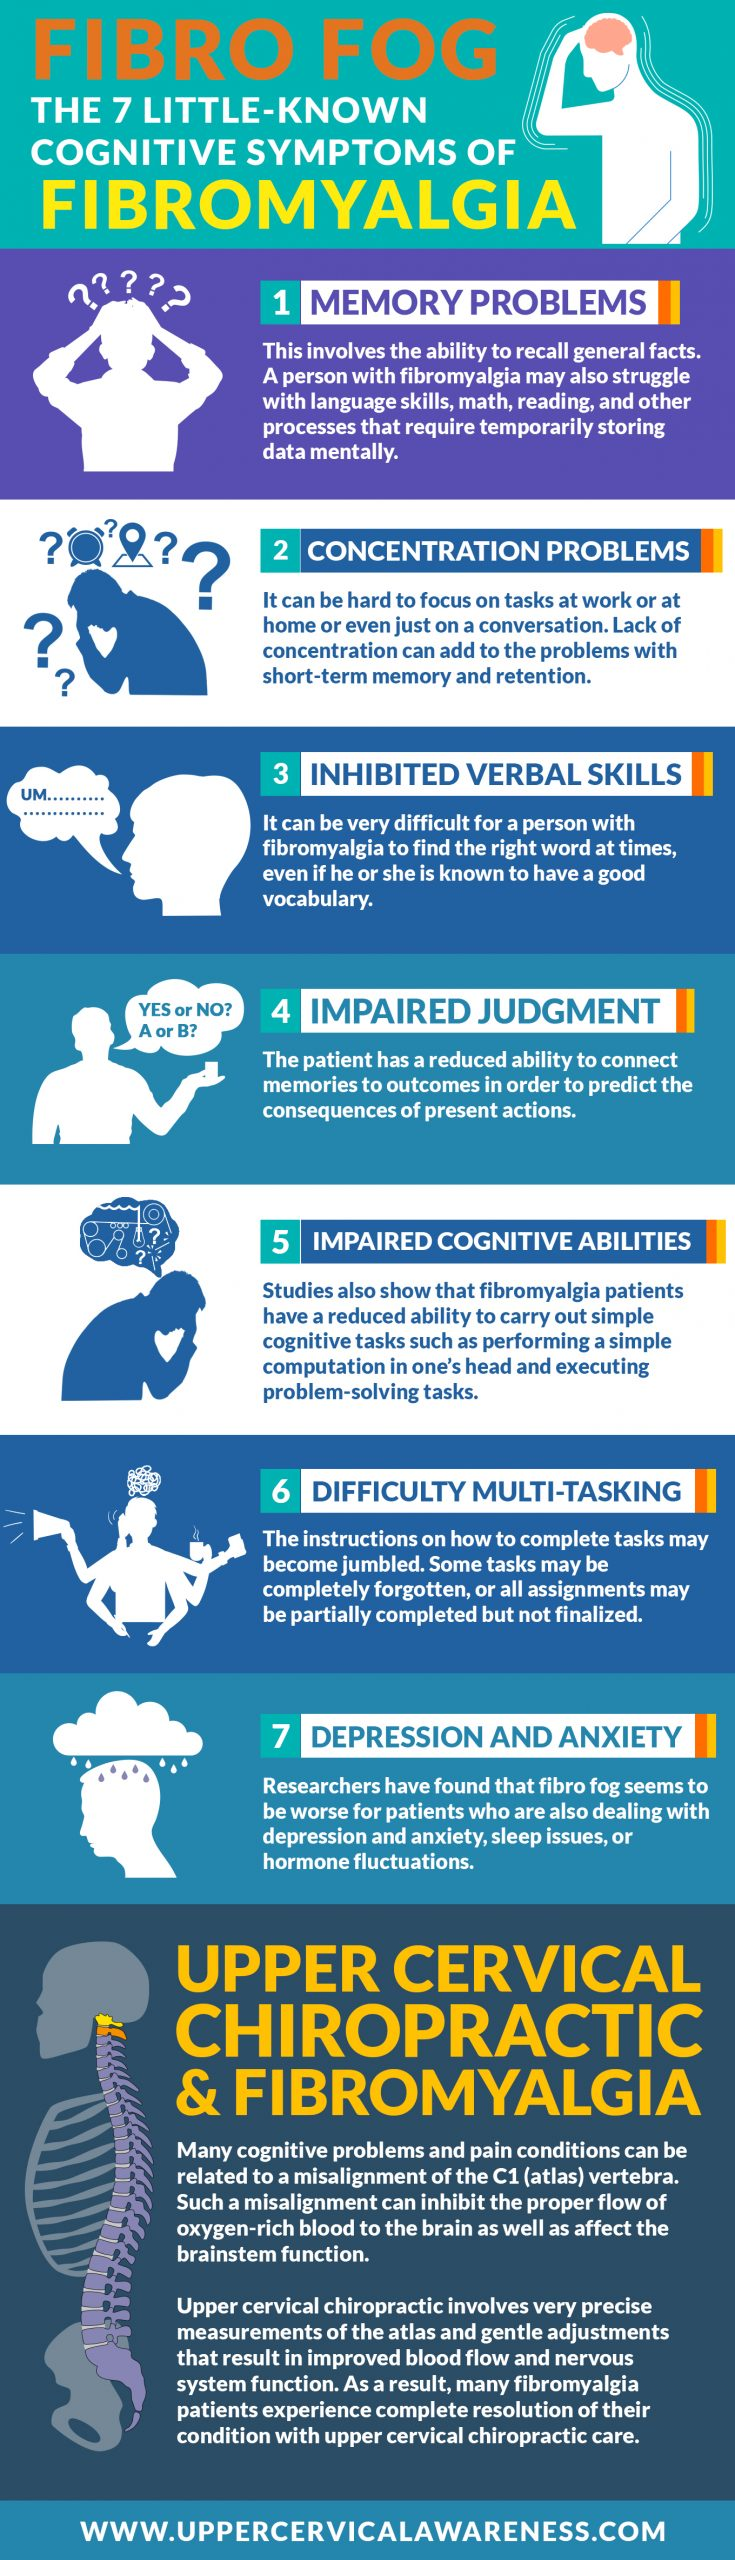 Fibro Fog – The 7 Little-Known Cognitive Symptoms of Fibromyalgia